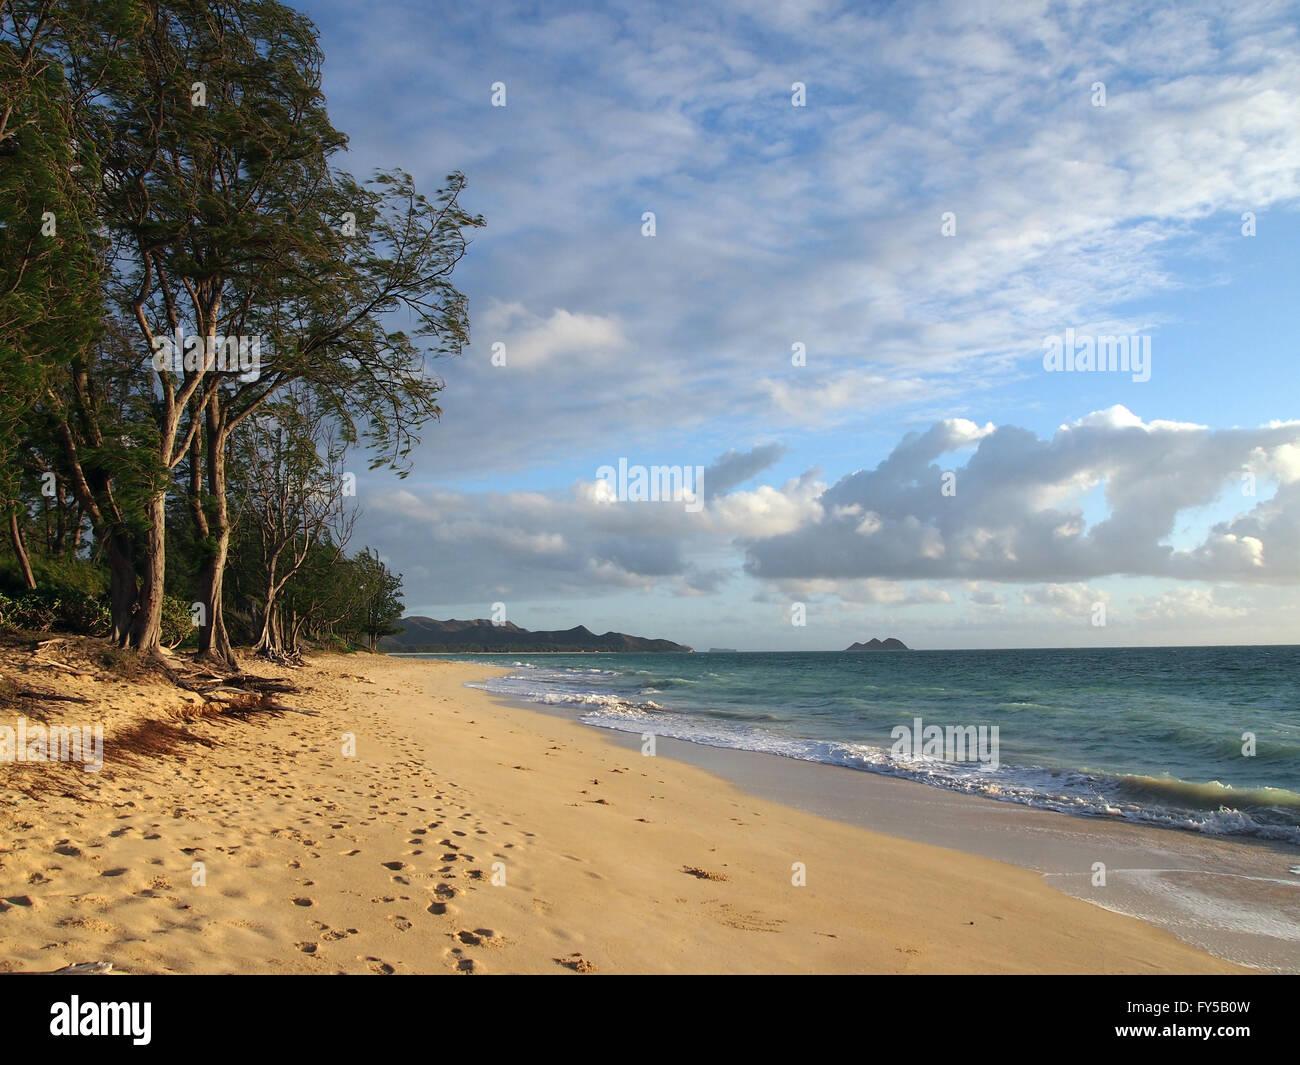 Gentle waves crash on Waimanalo Beach on Oahu, Hawaii.  Looking north towards Lanikai. - Stock Image